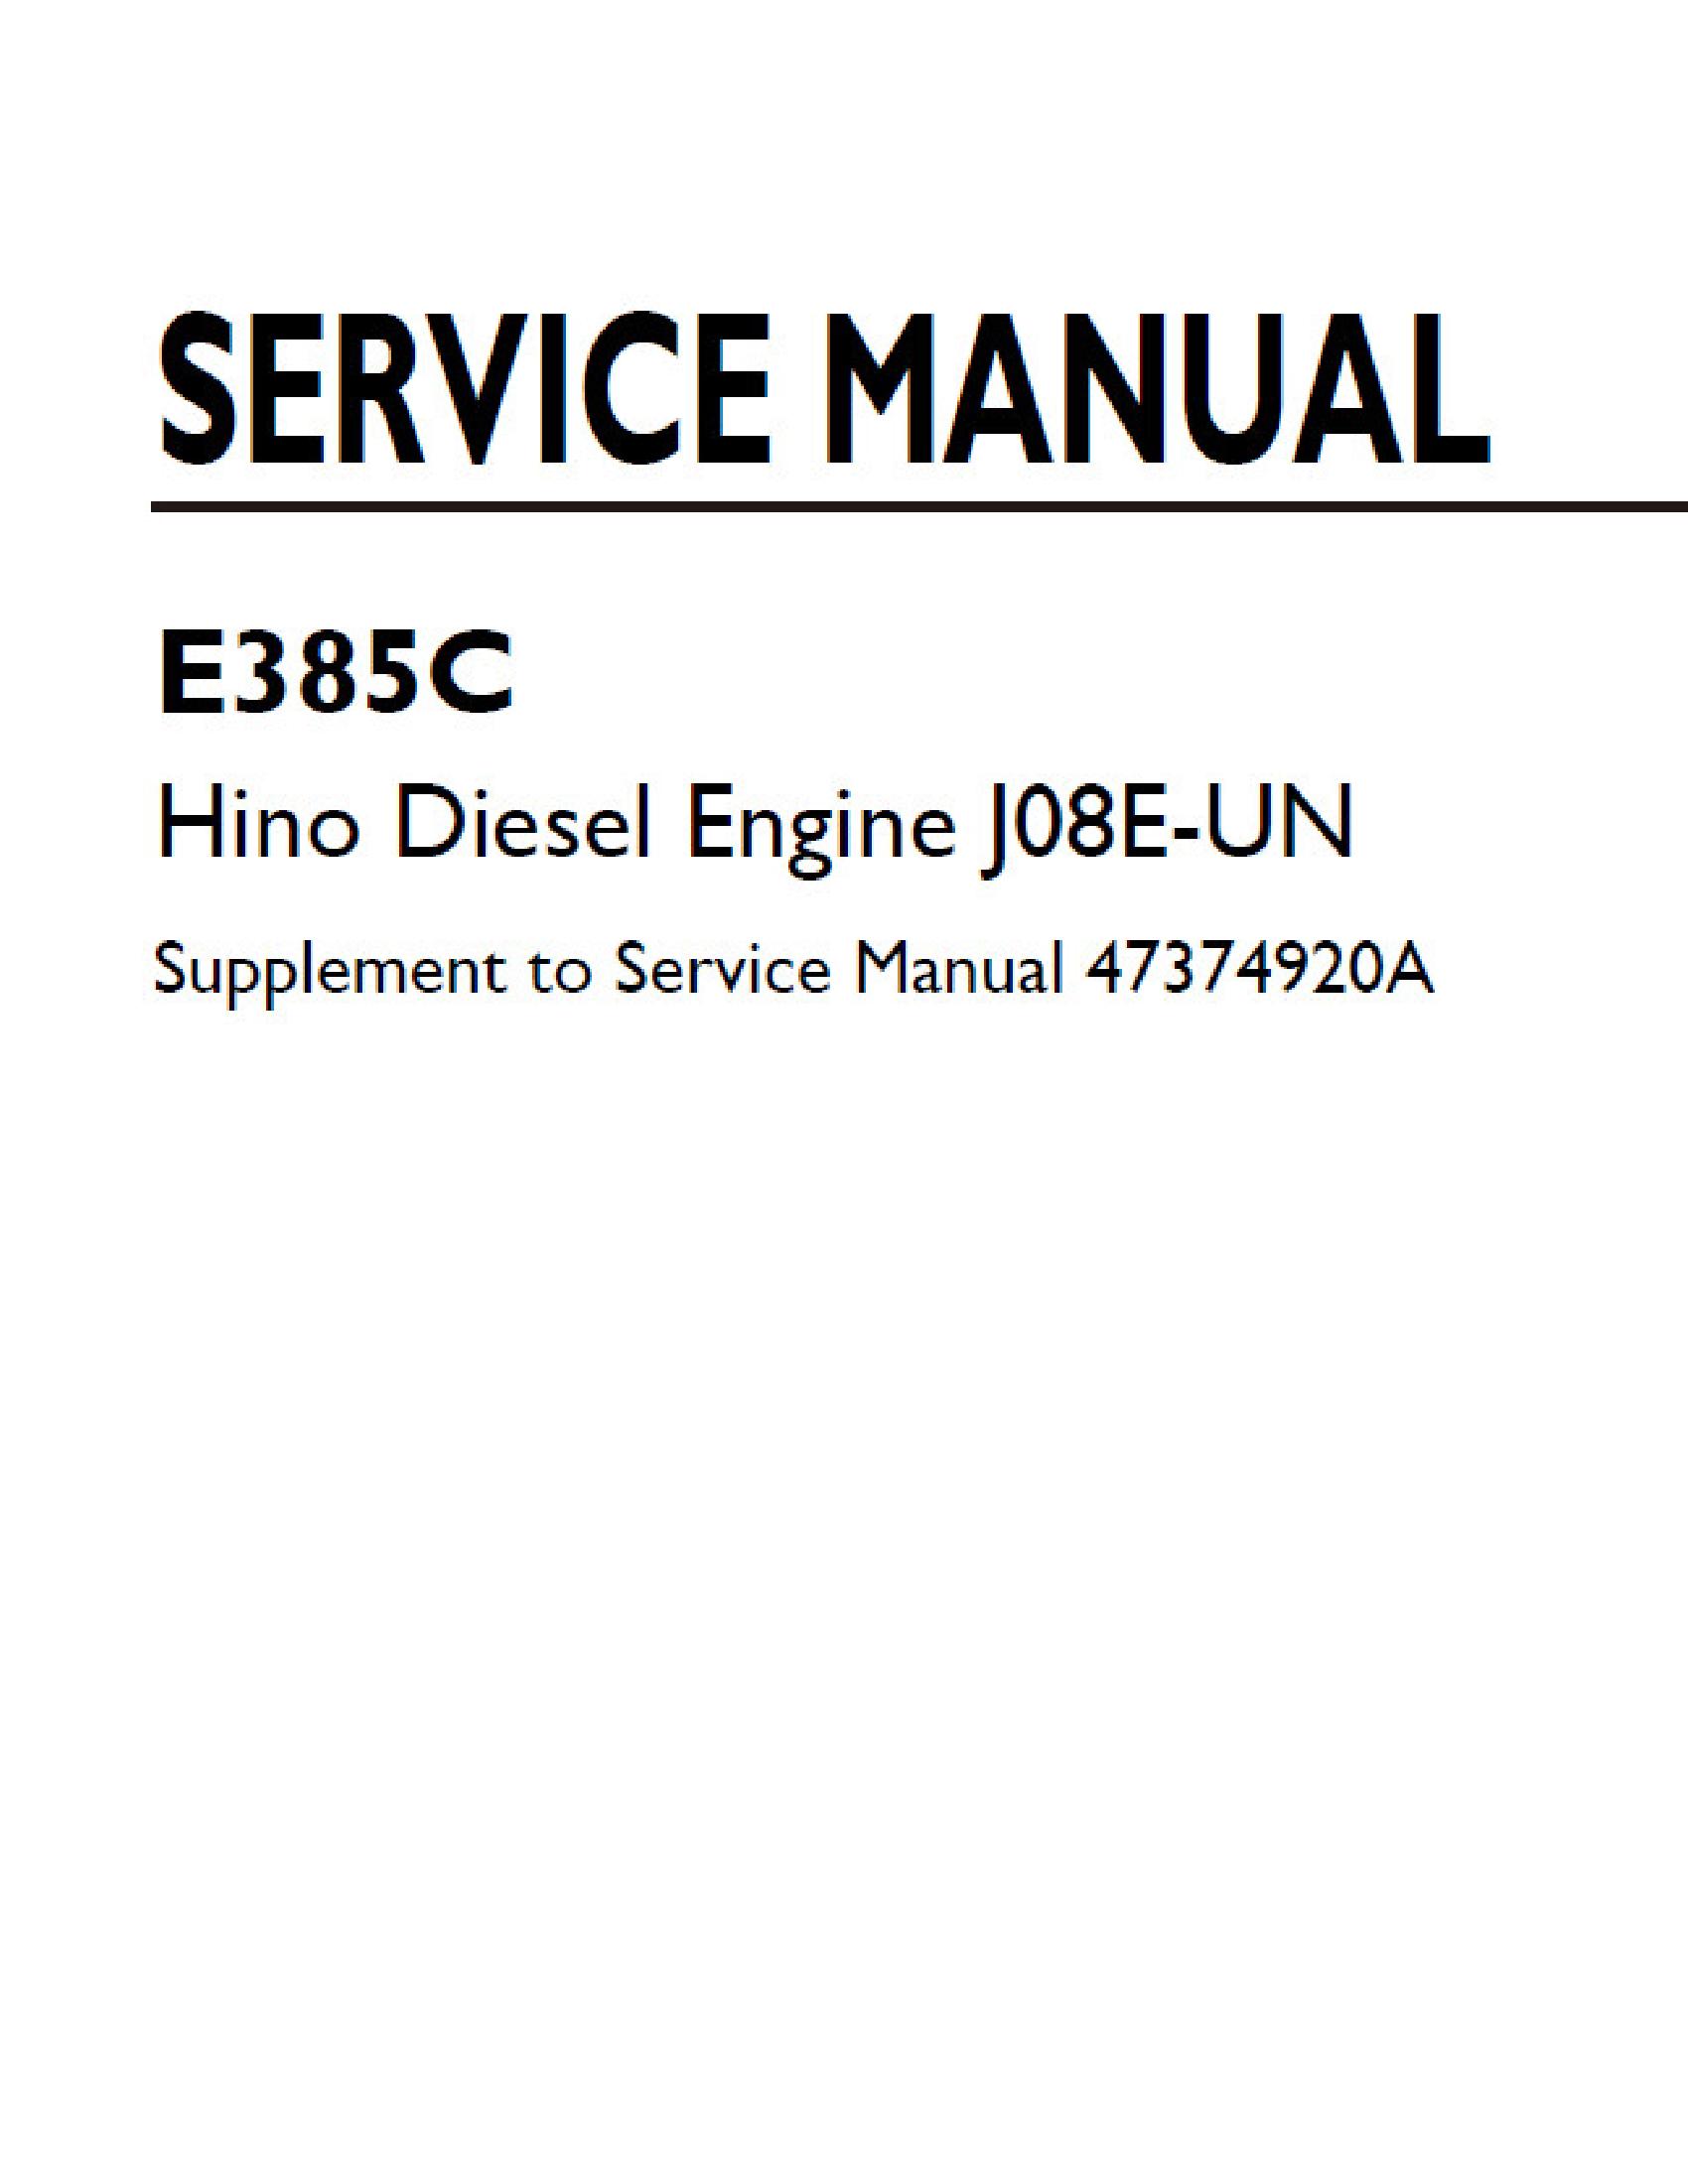 New Holland J08e Un Hino Diesel Engine Manual Hino Repair Manuals Manual